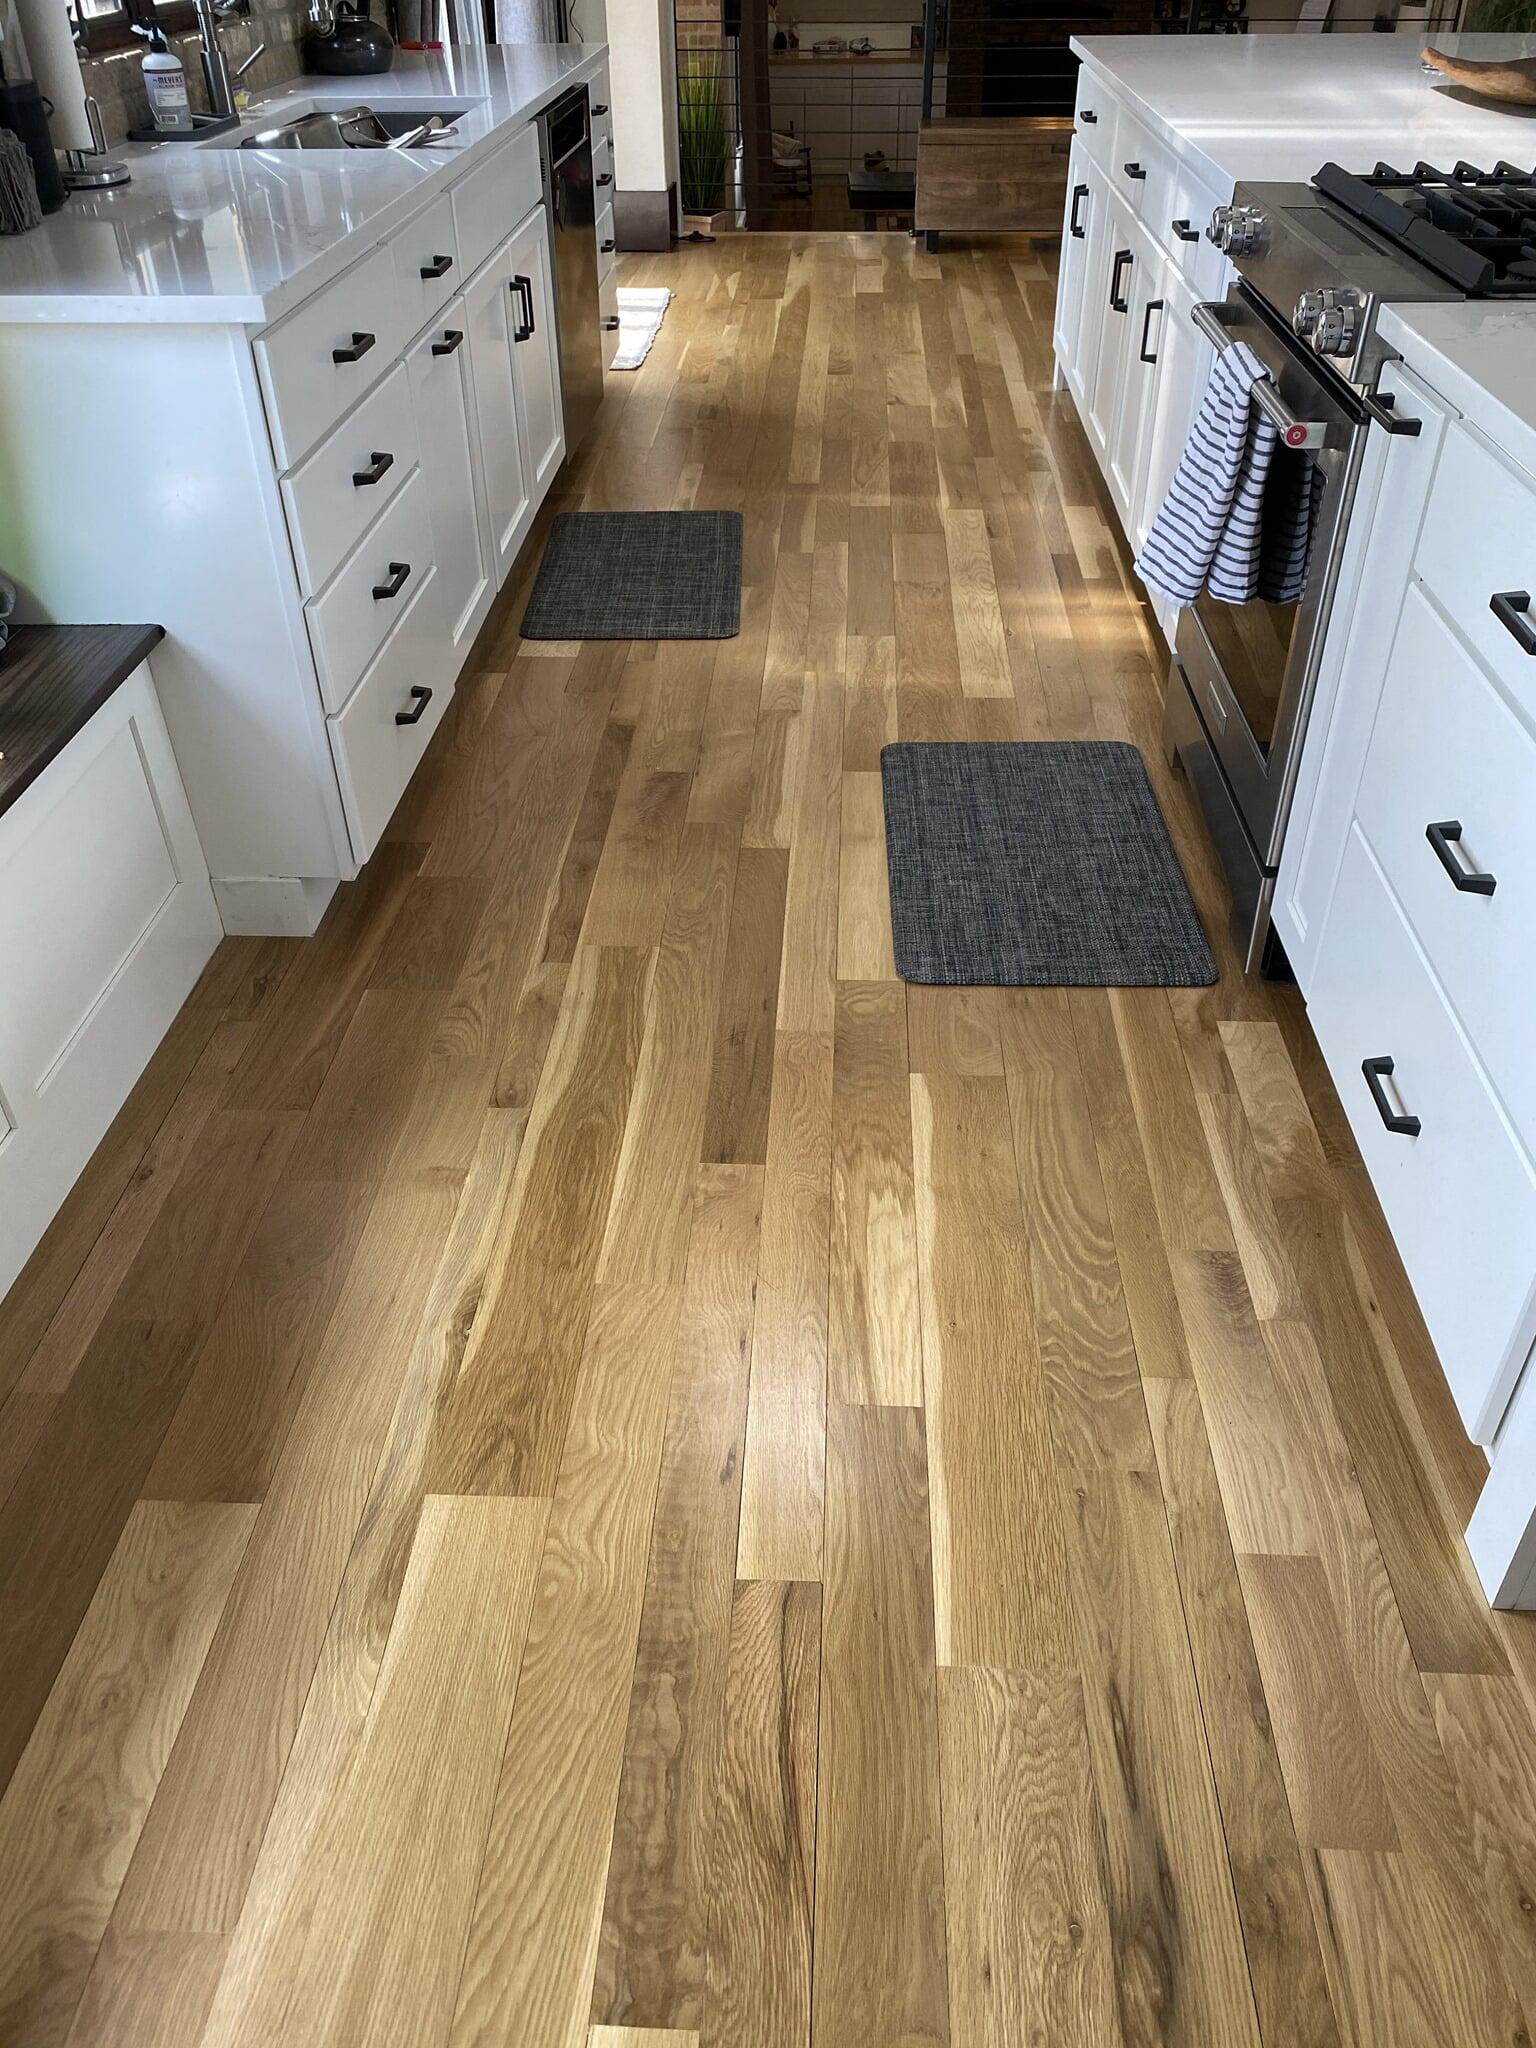 Kitchen flooring in Wellington, CO from JT Flooring